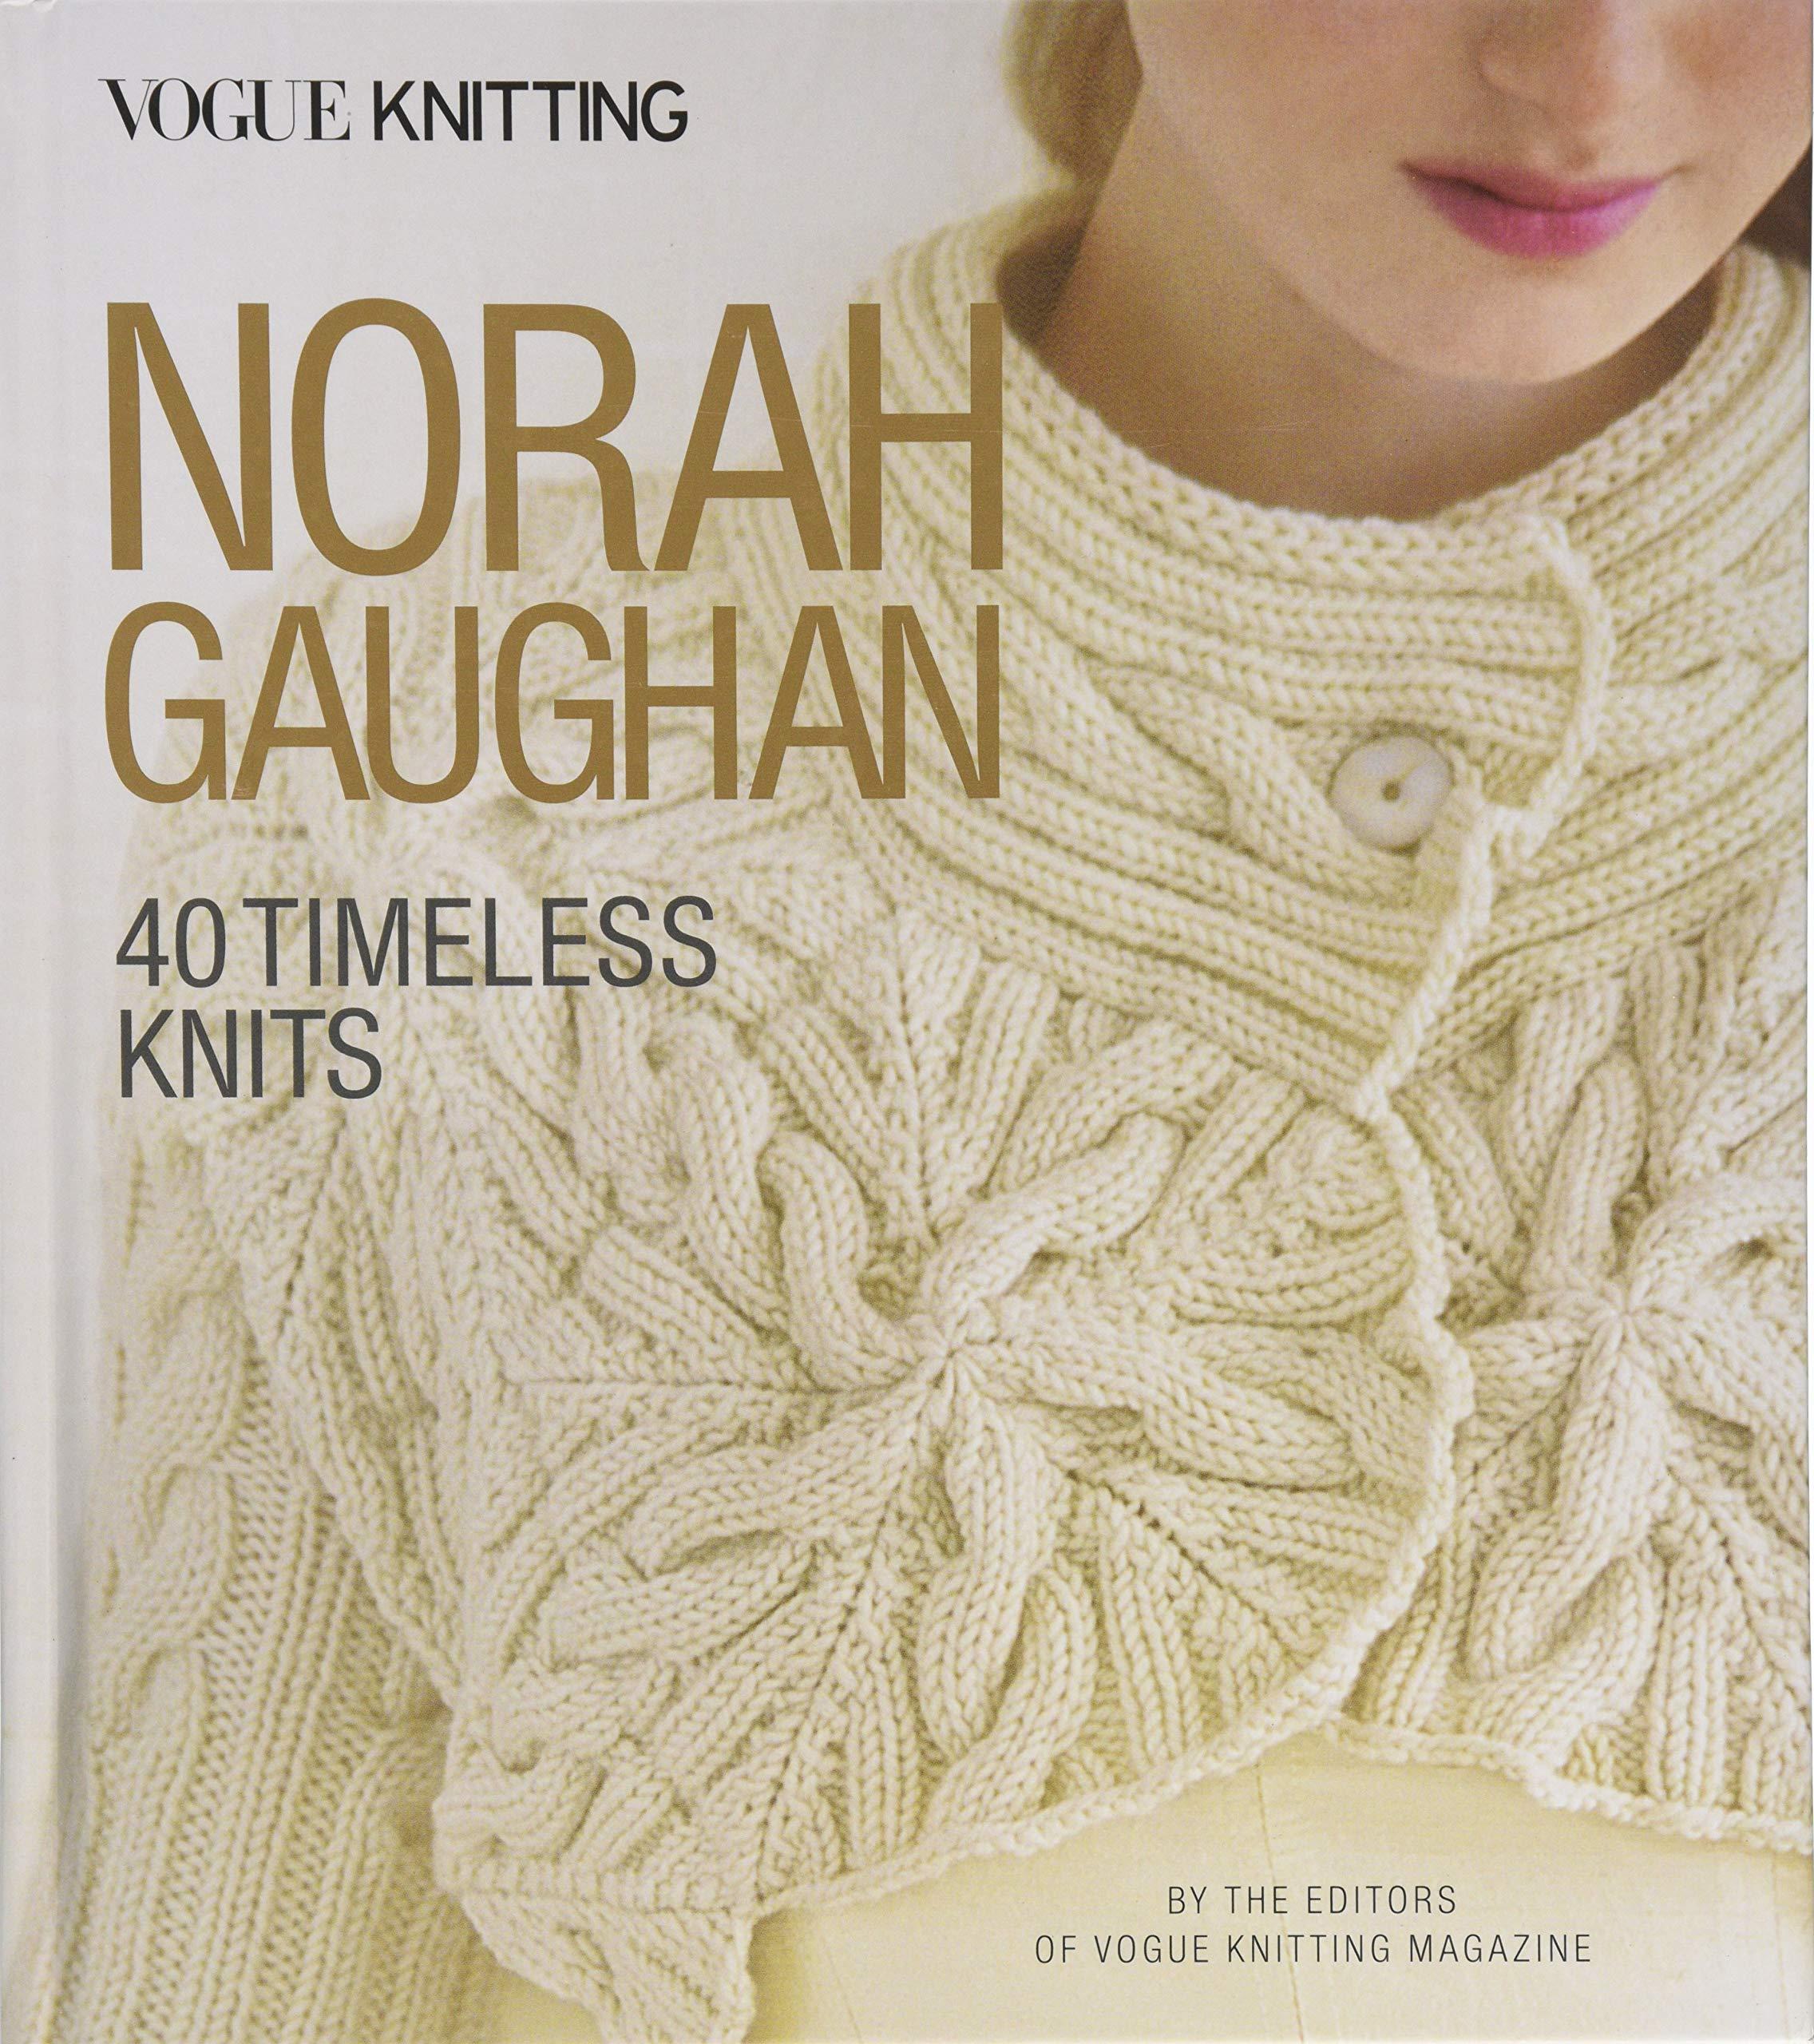 VOGUE R KNITTING NORAH GAUGHA: 40 Timeless Knits Vogue ...